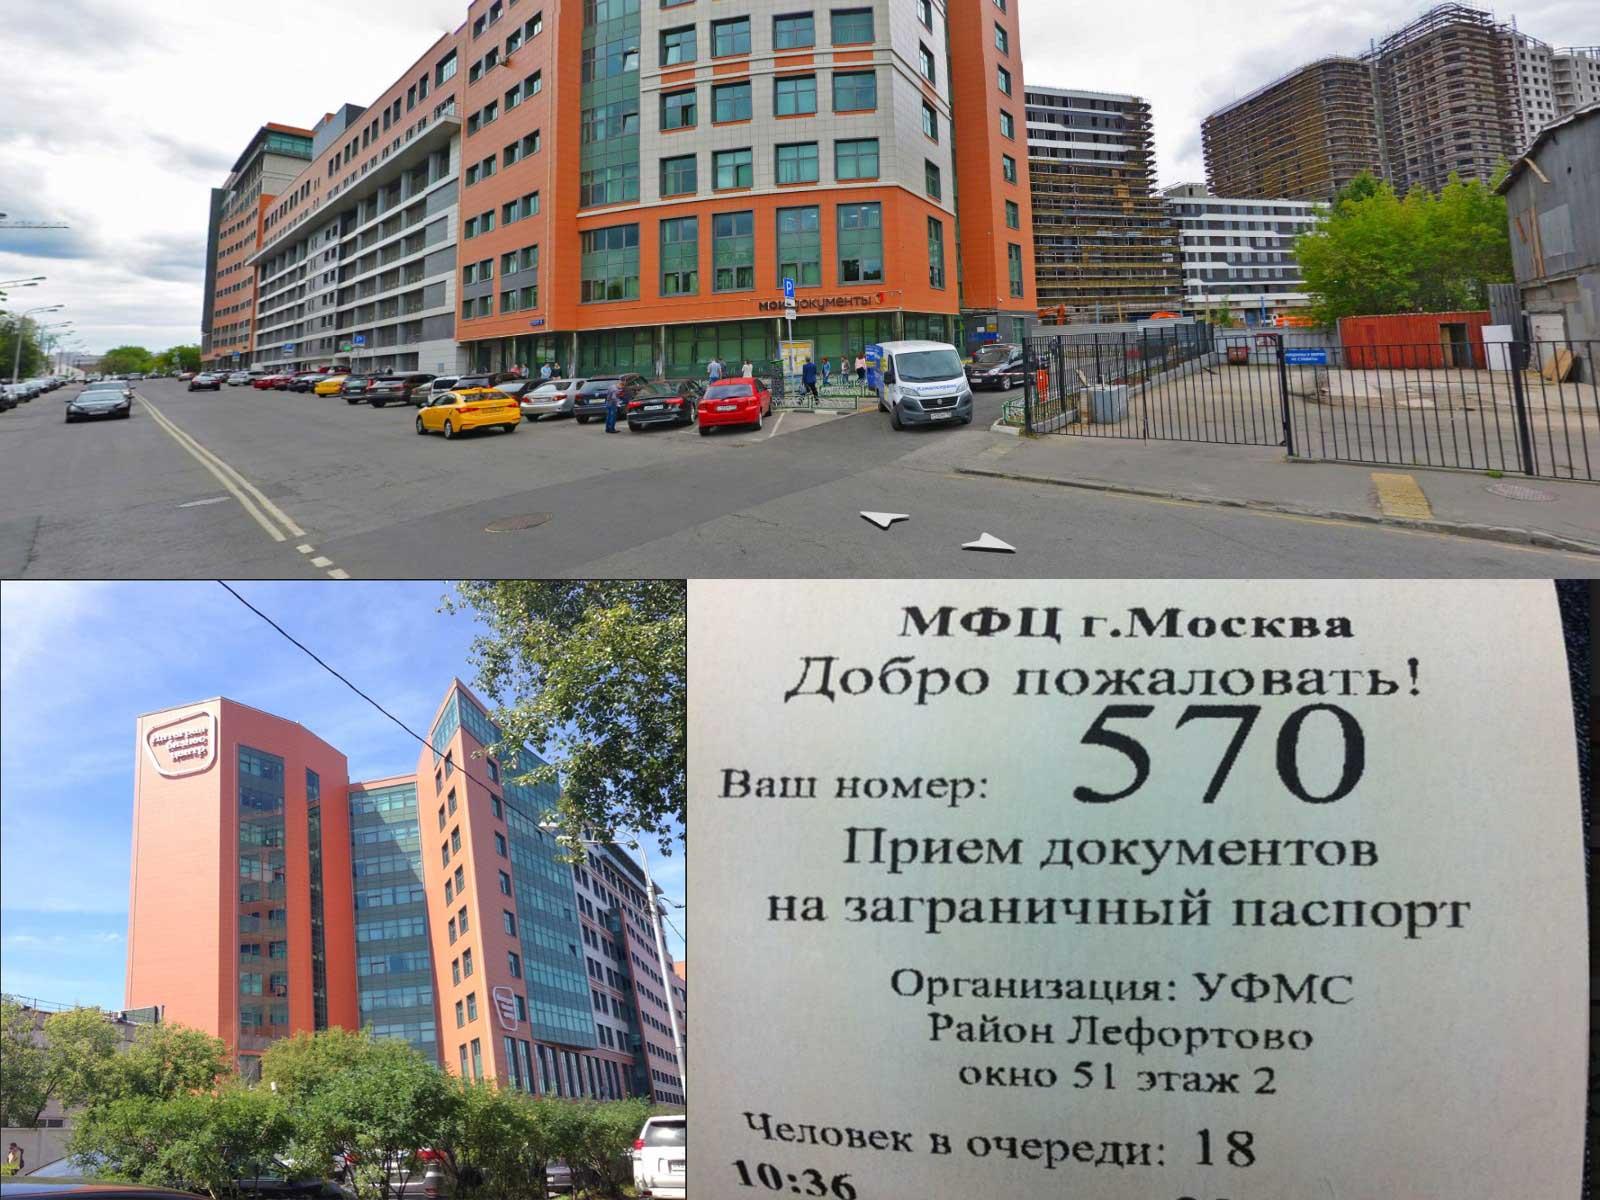 вид на здание МФЦ Лефортово уфмс